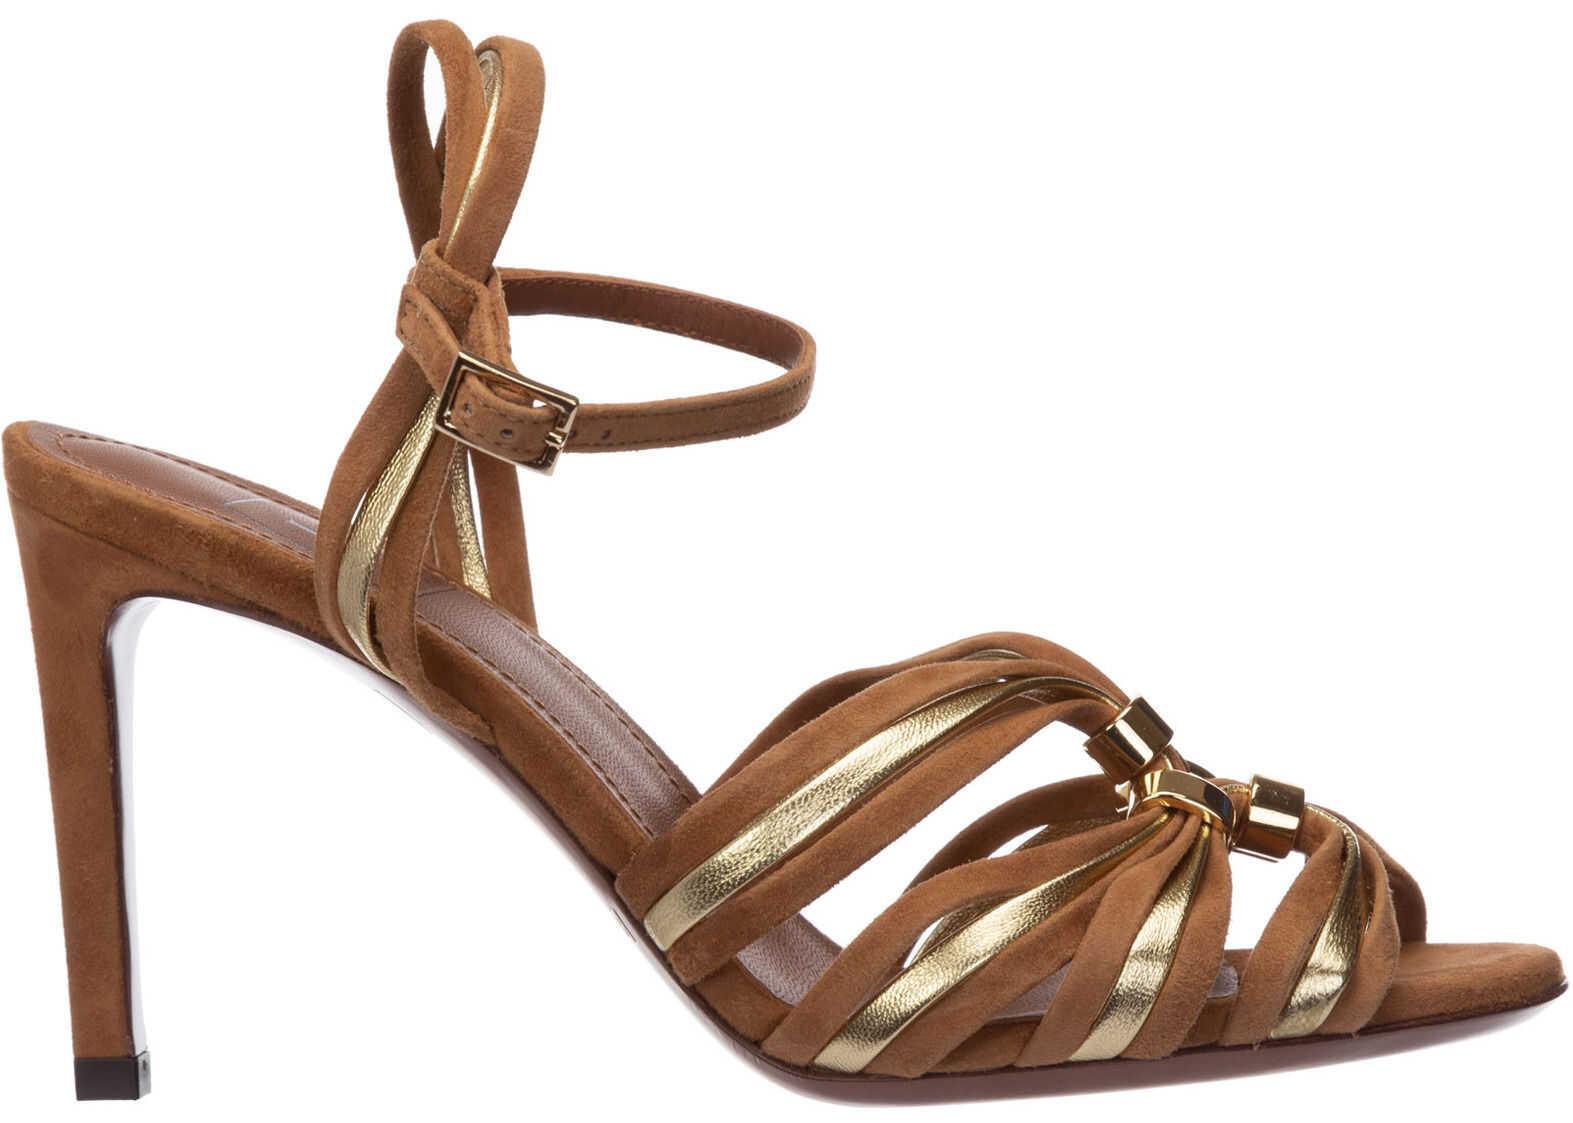 L'Autre Chose Heel Sandals LDL021.85CP2930G570 Brown imagine b-mall.ro